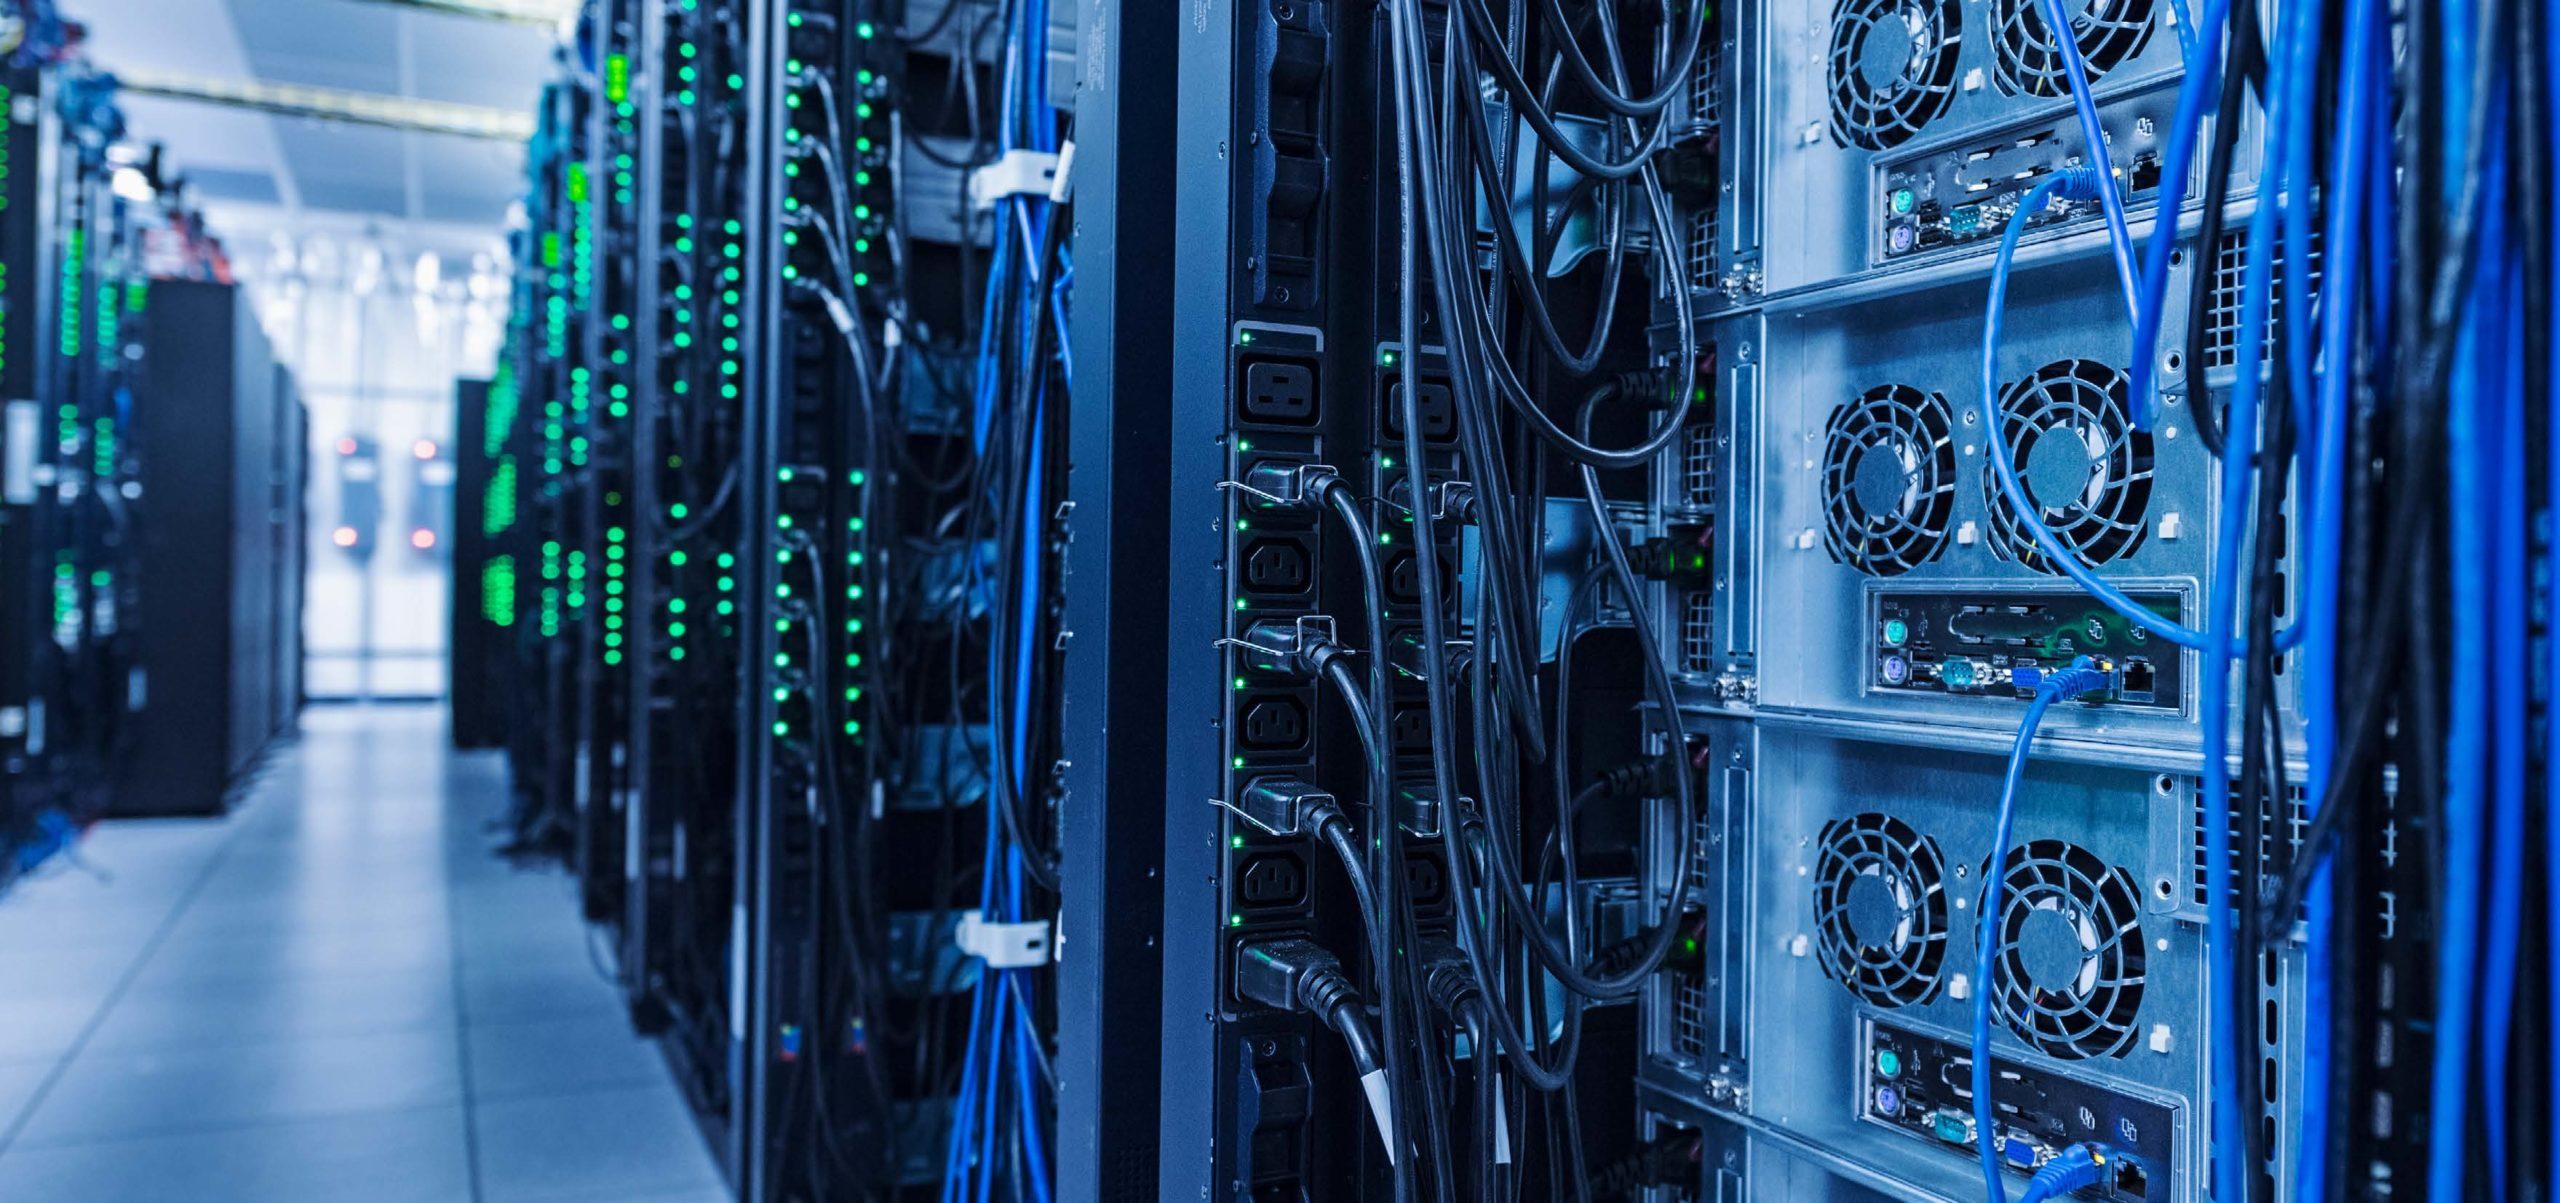 CBRE publishes European Data Centers Q1 2020